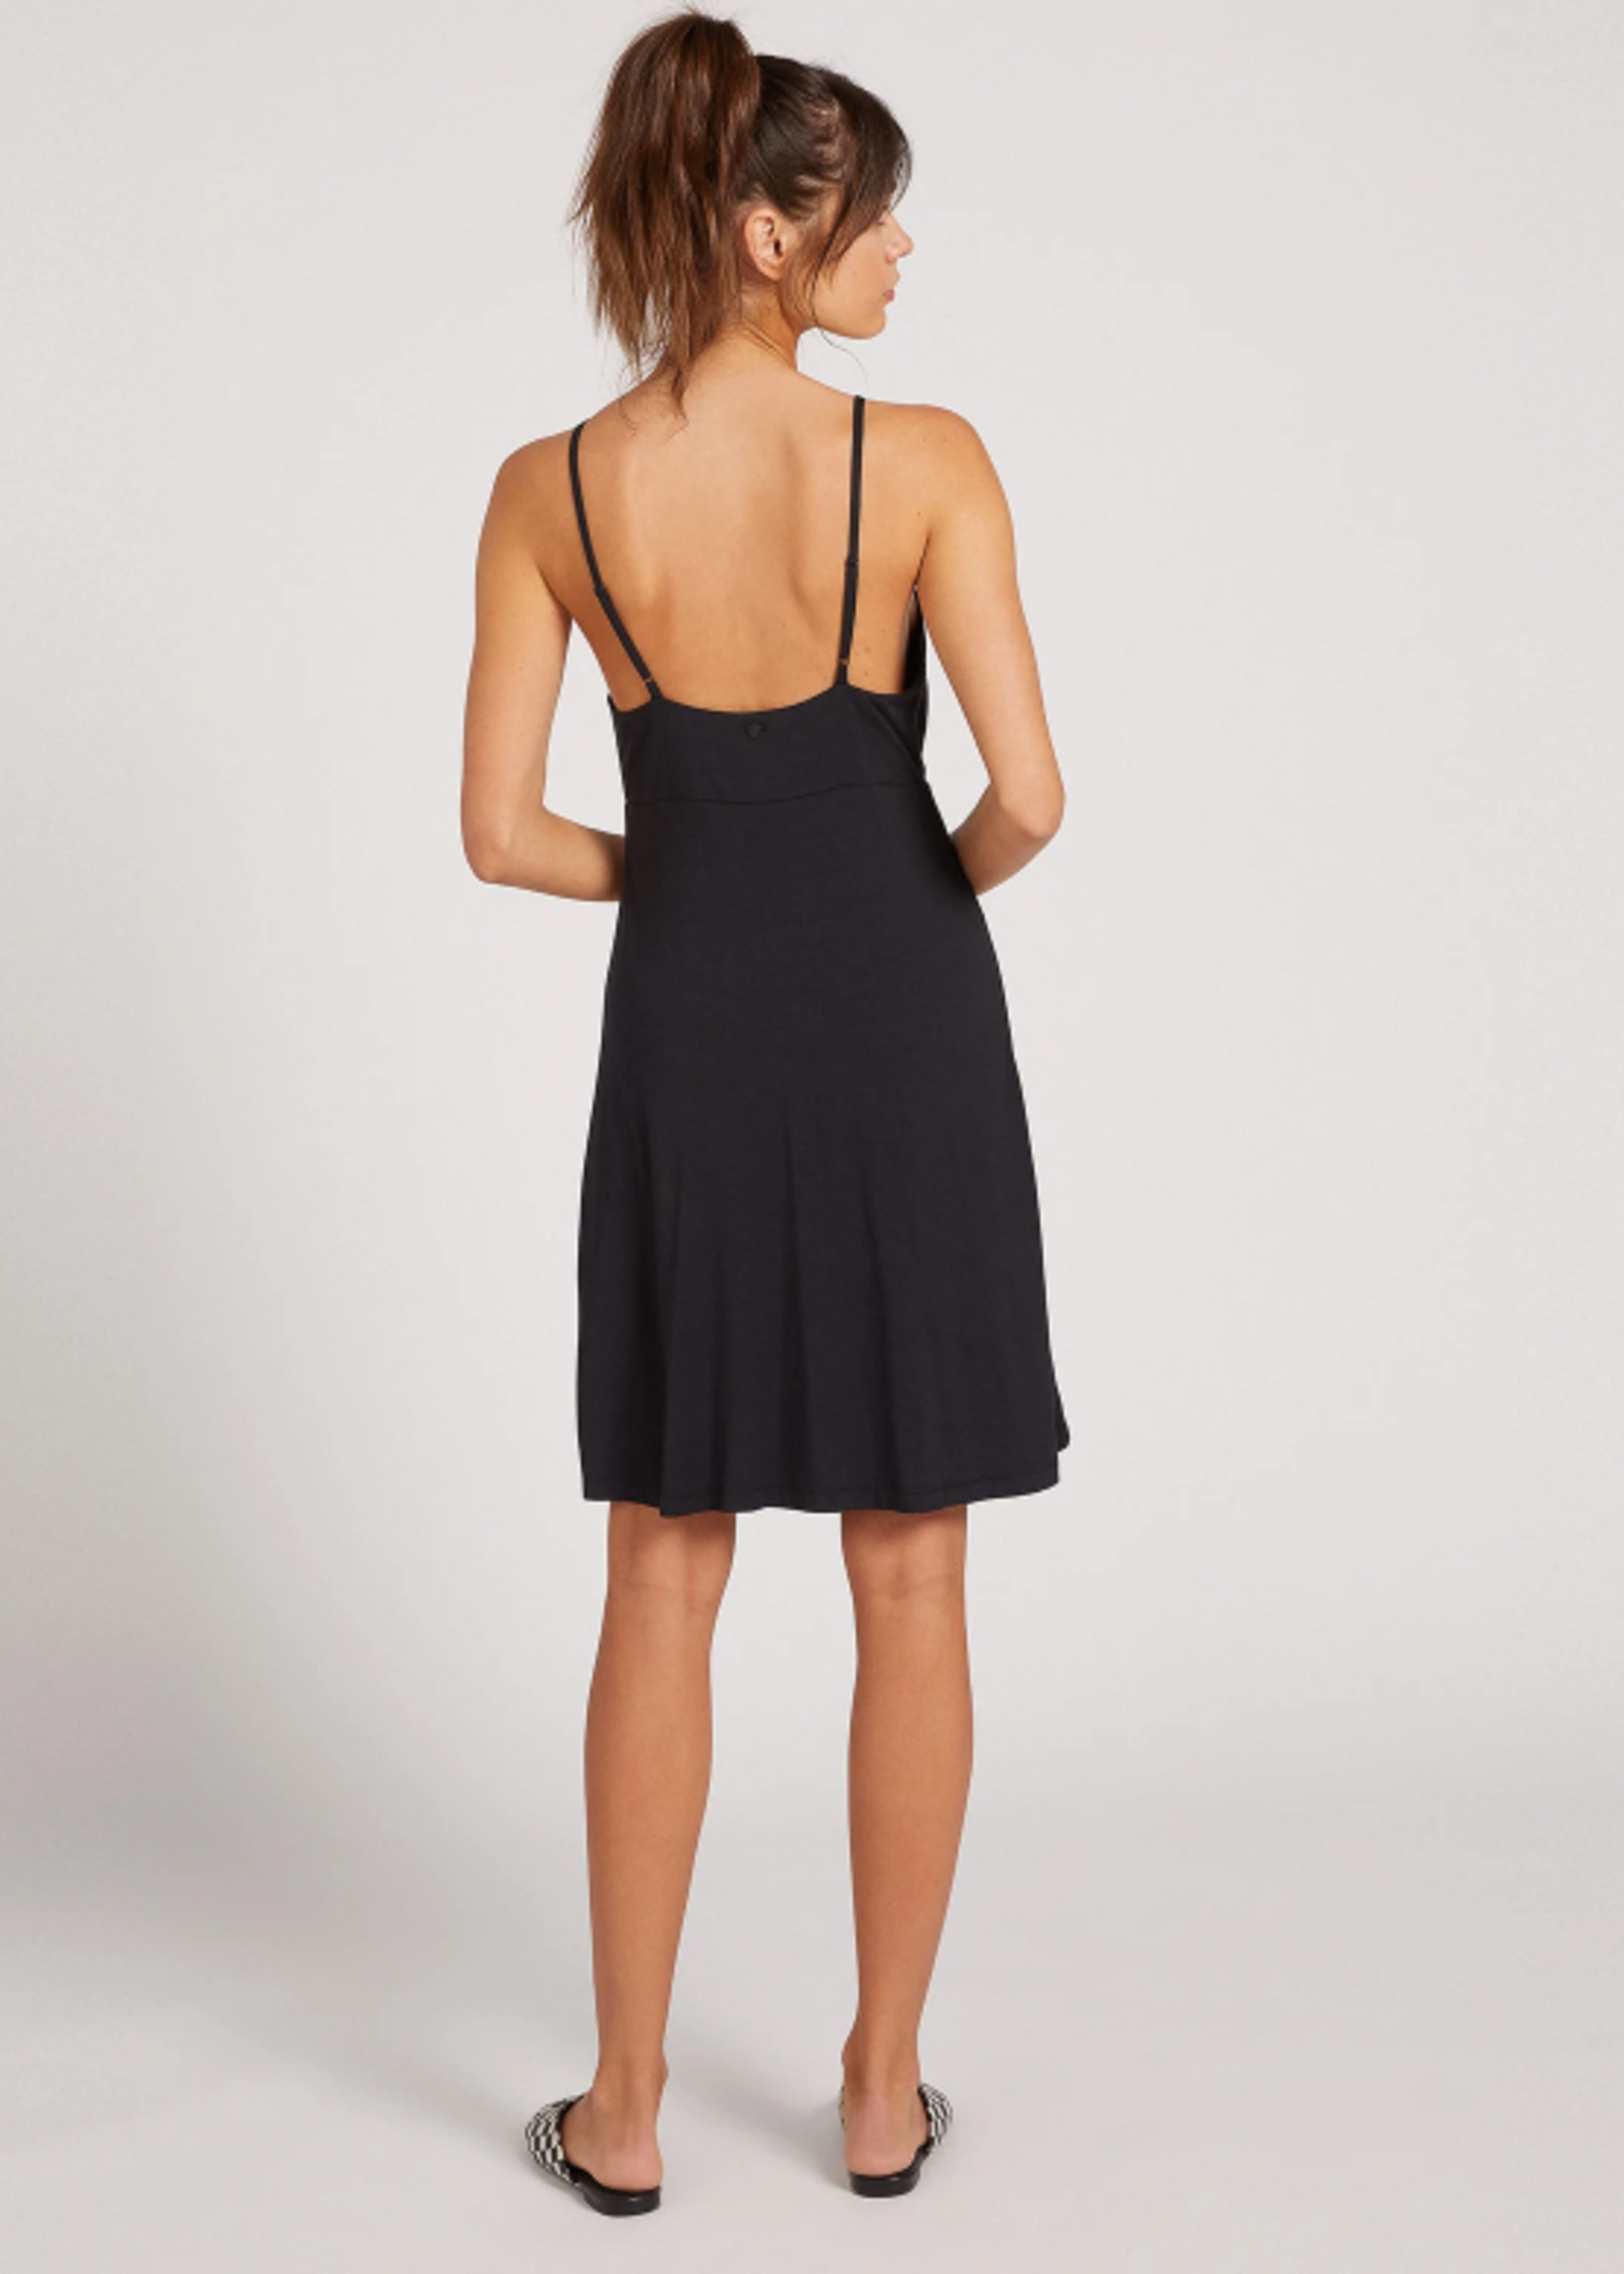 Volcom Mr. Twister Dress - Black